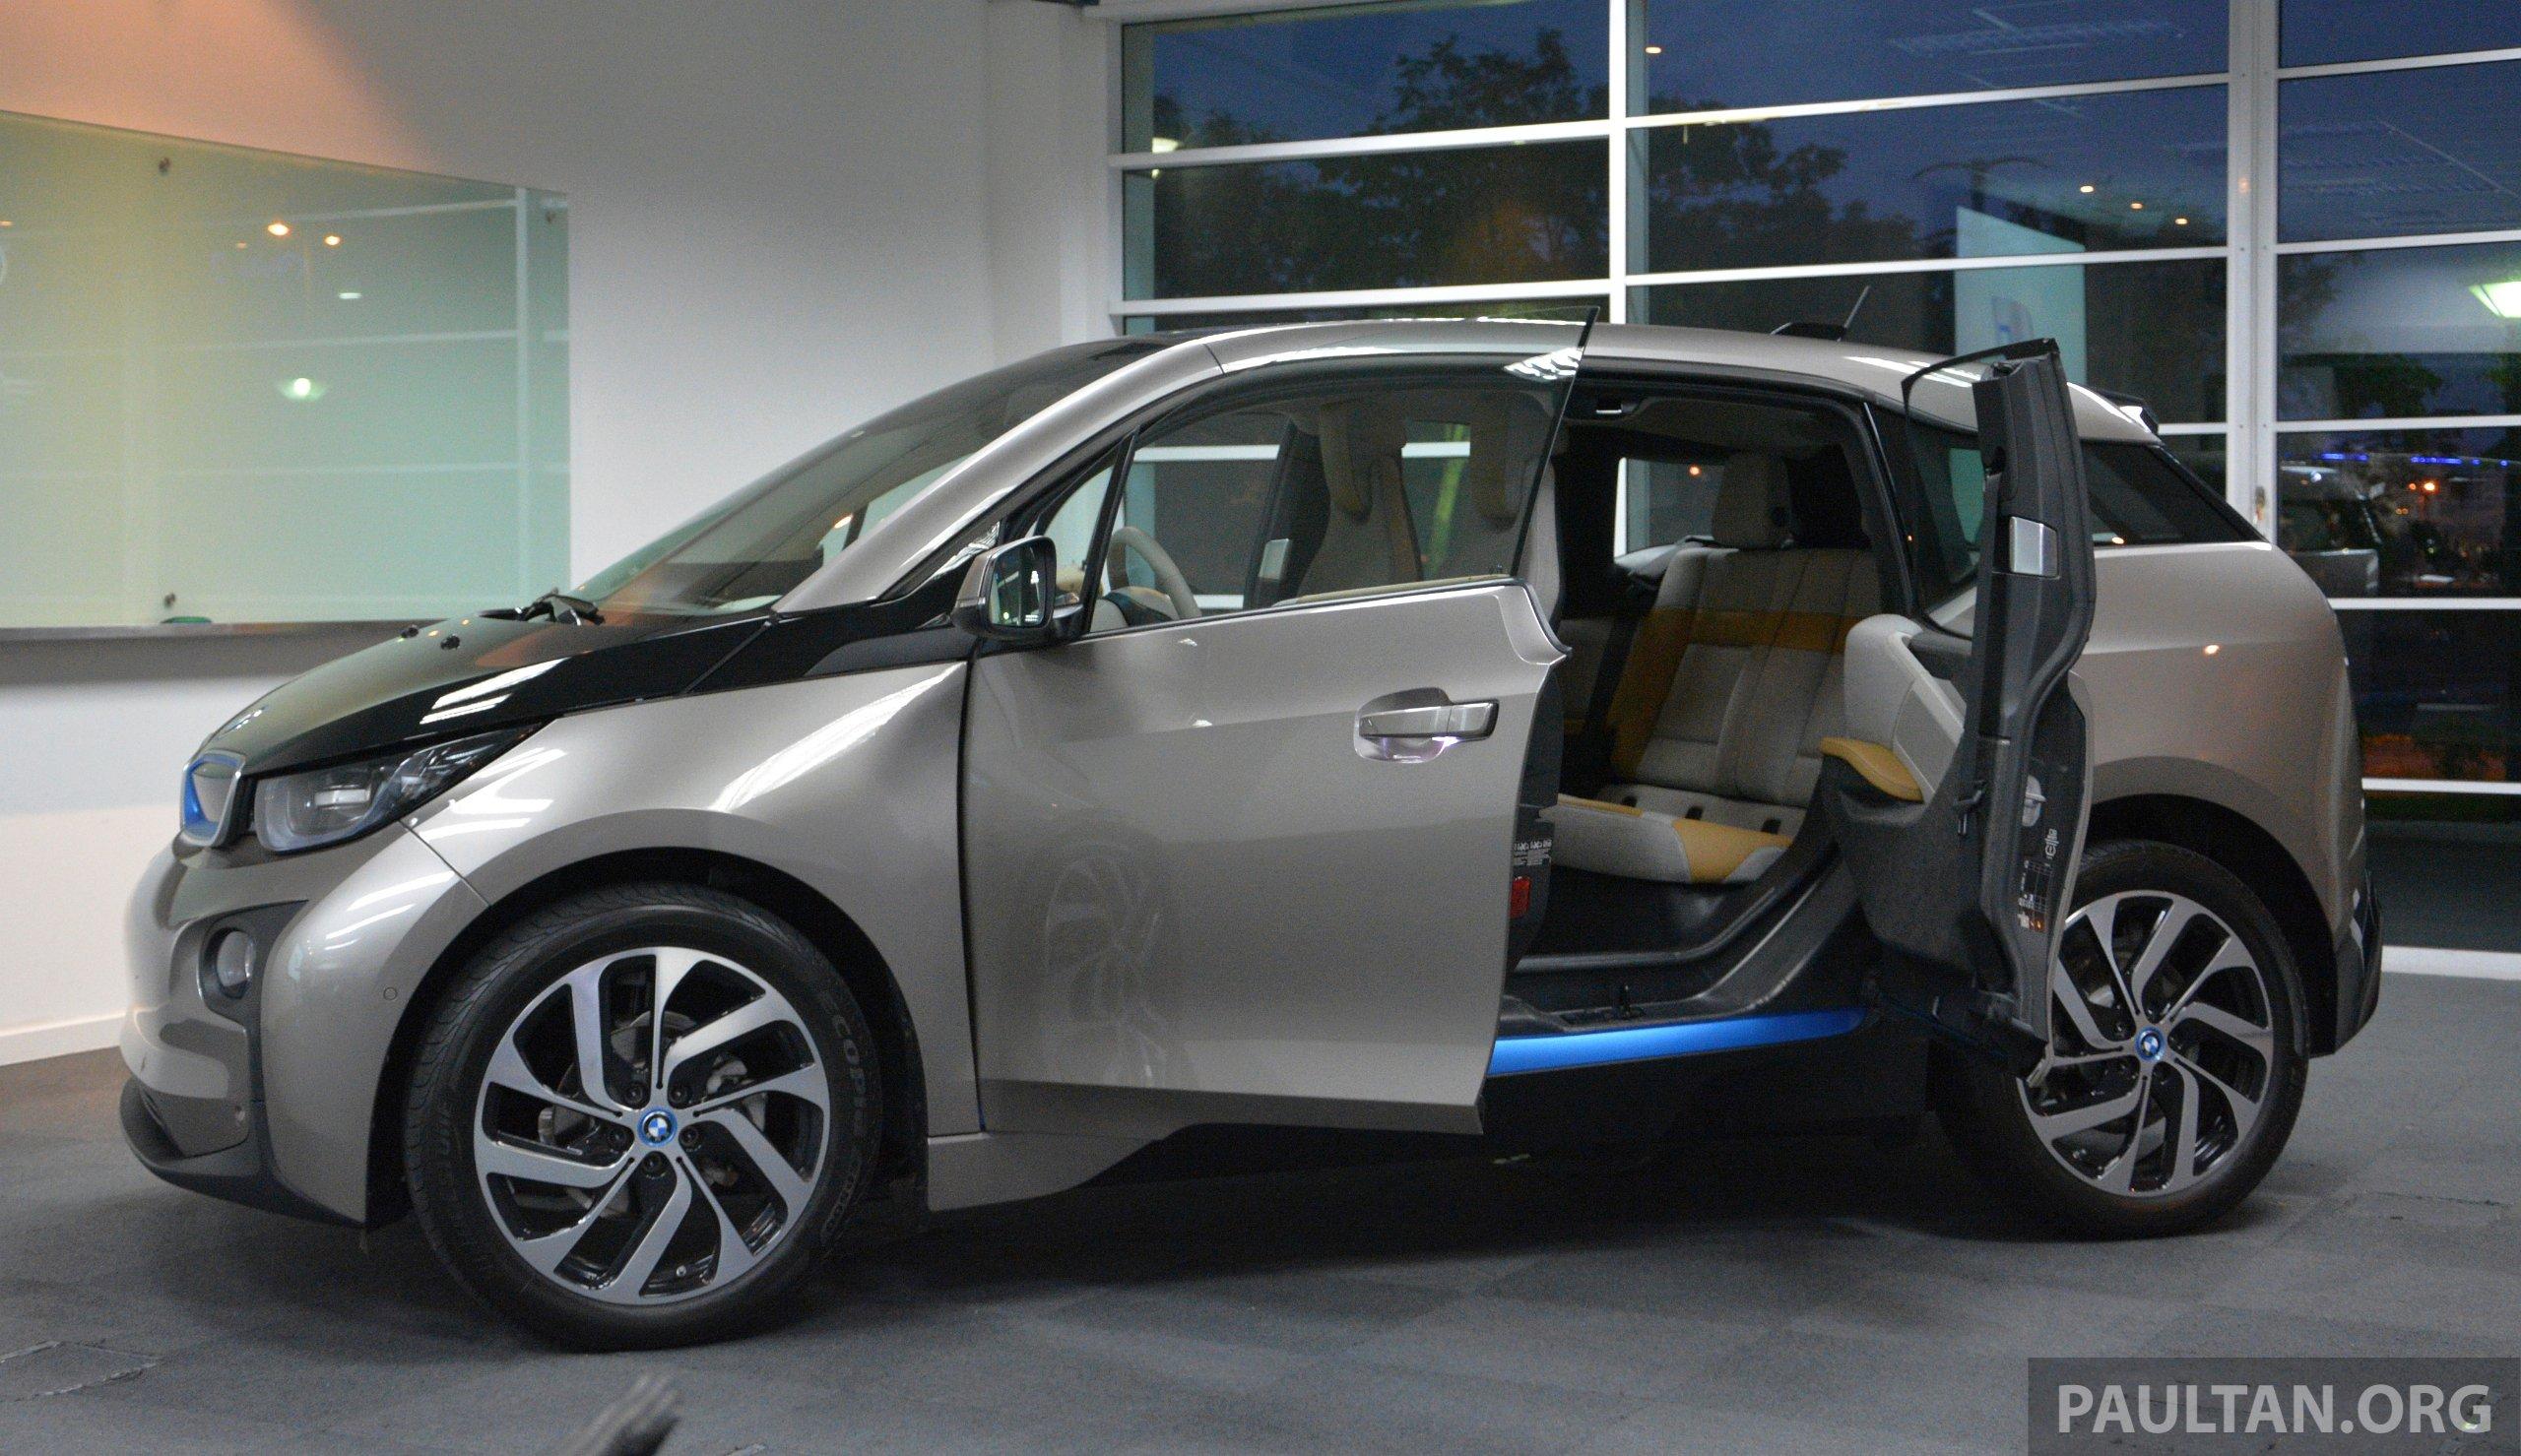 I3 Bmw 2018 >> BMW i3 tried in Cyberjaya, but not coming to Malaysia Paul Tan - Image 246588